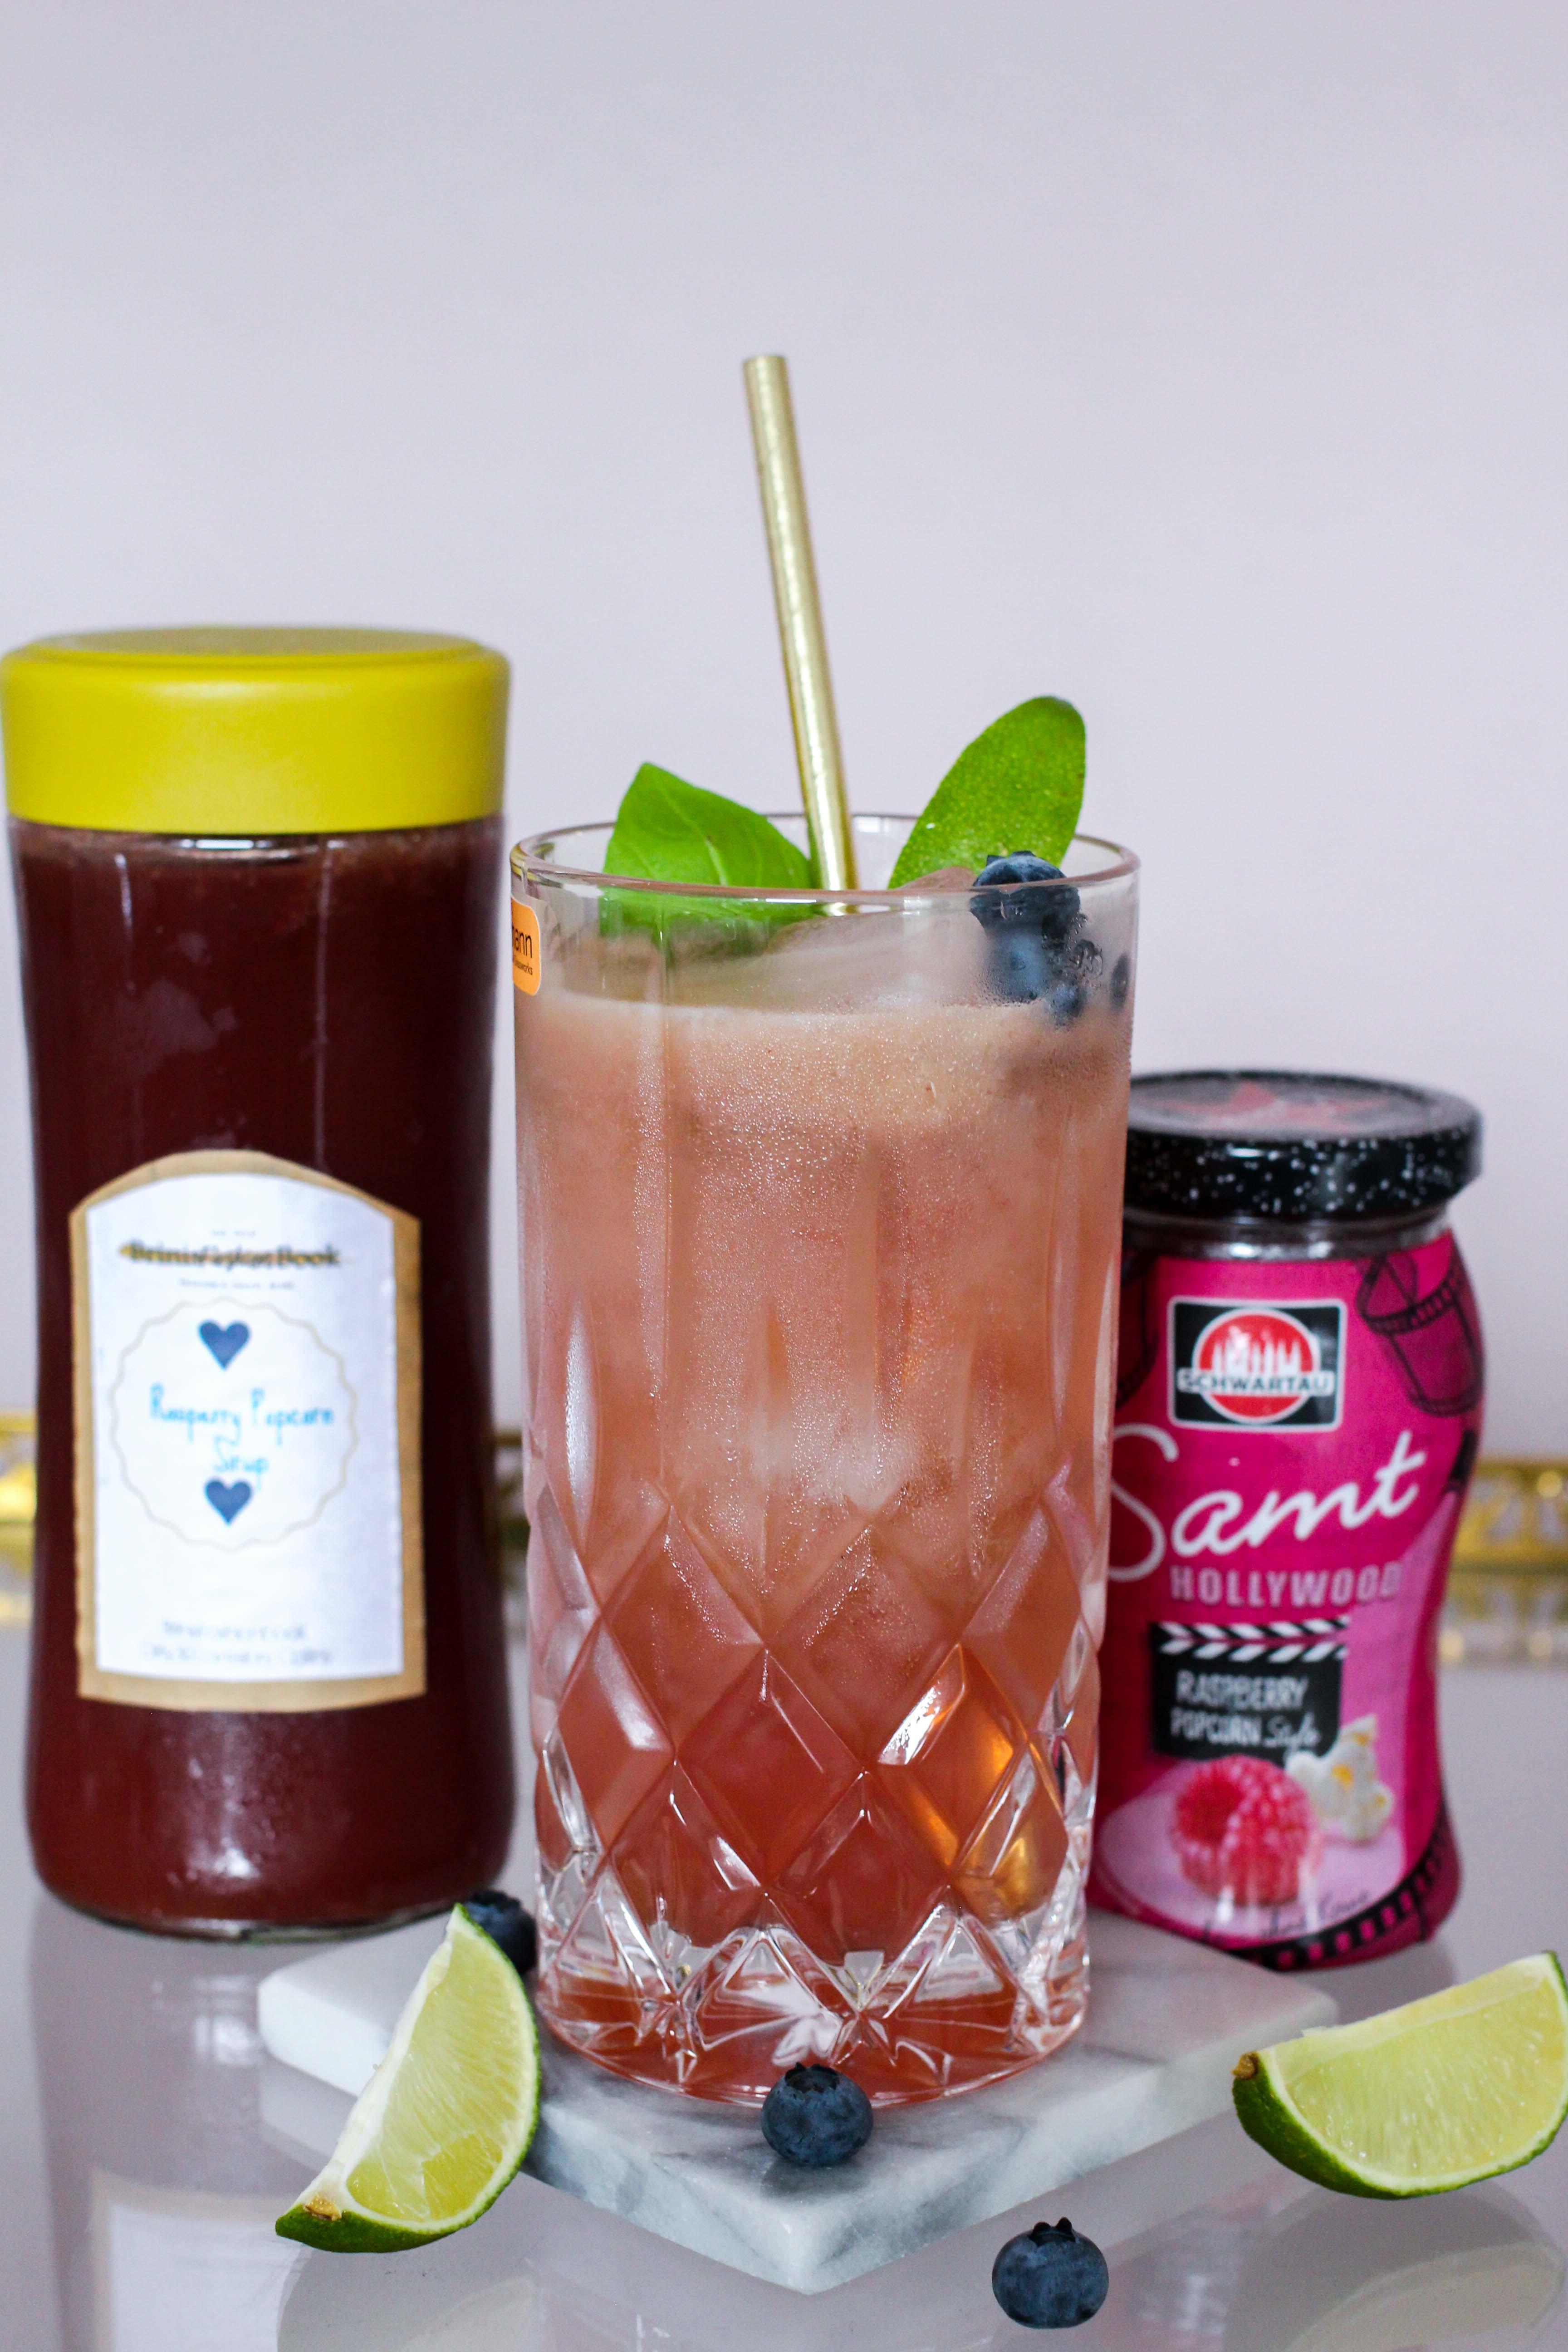 30ster Geburtstag Gin Rezept Siegfried Gin Cocktail BrinisFashionBook Dirty30 Lovestory Collins Rasperry Popcorn 3